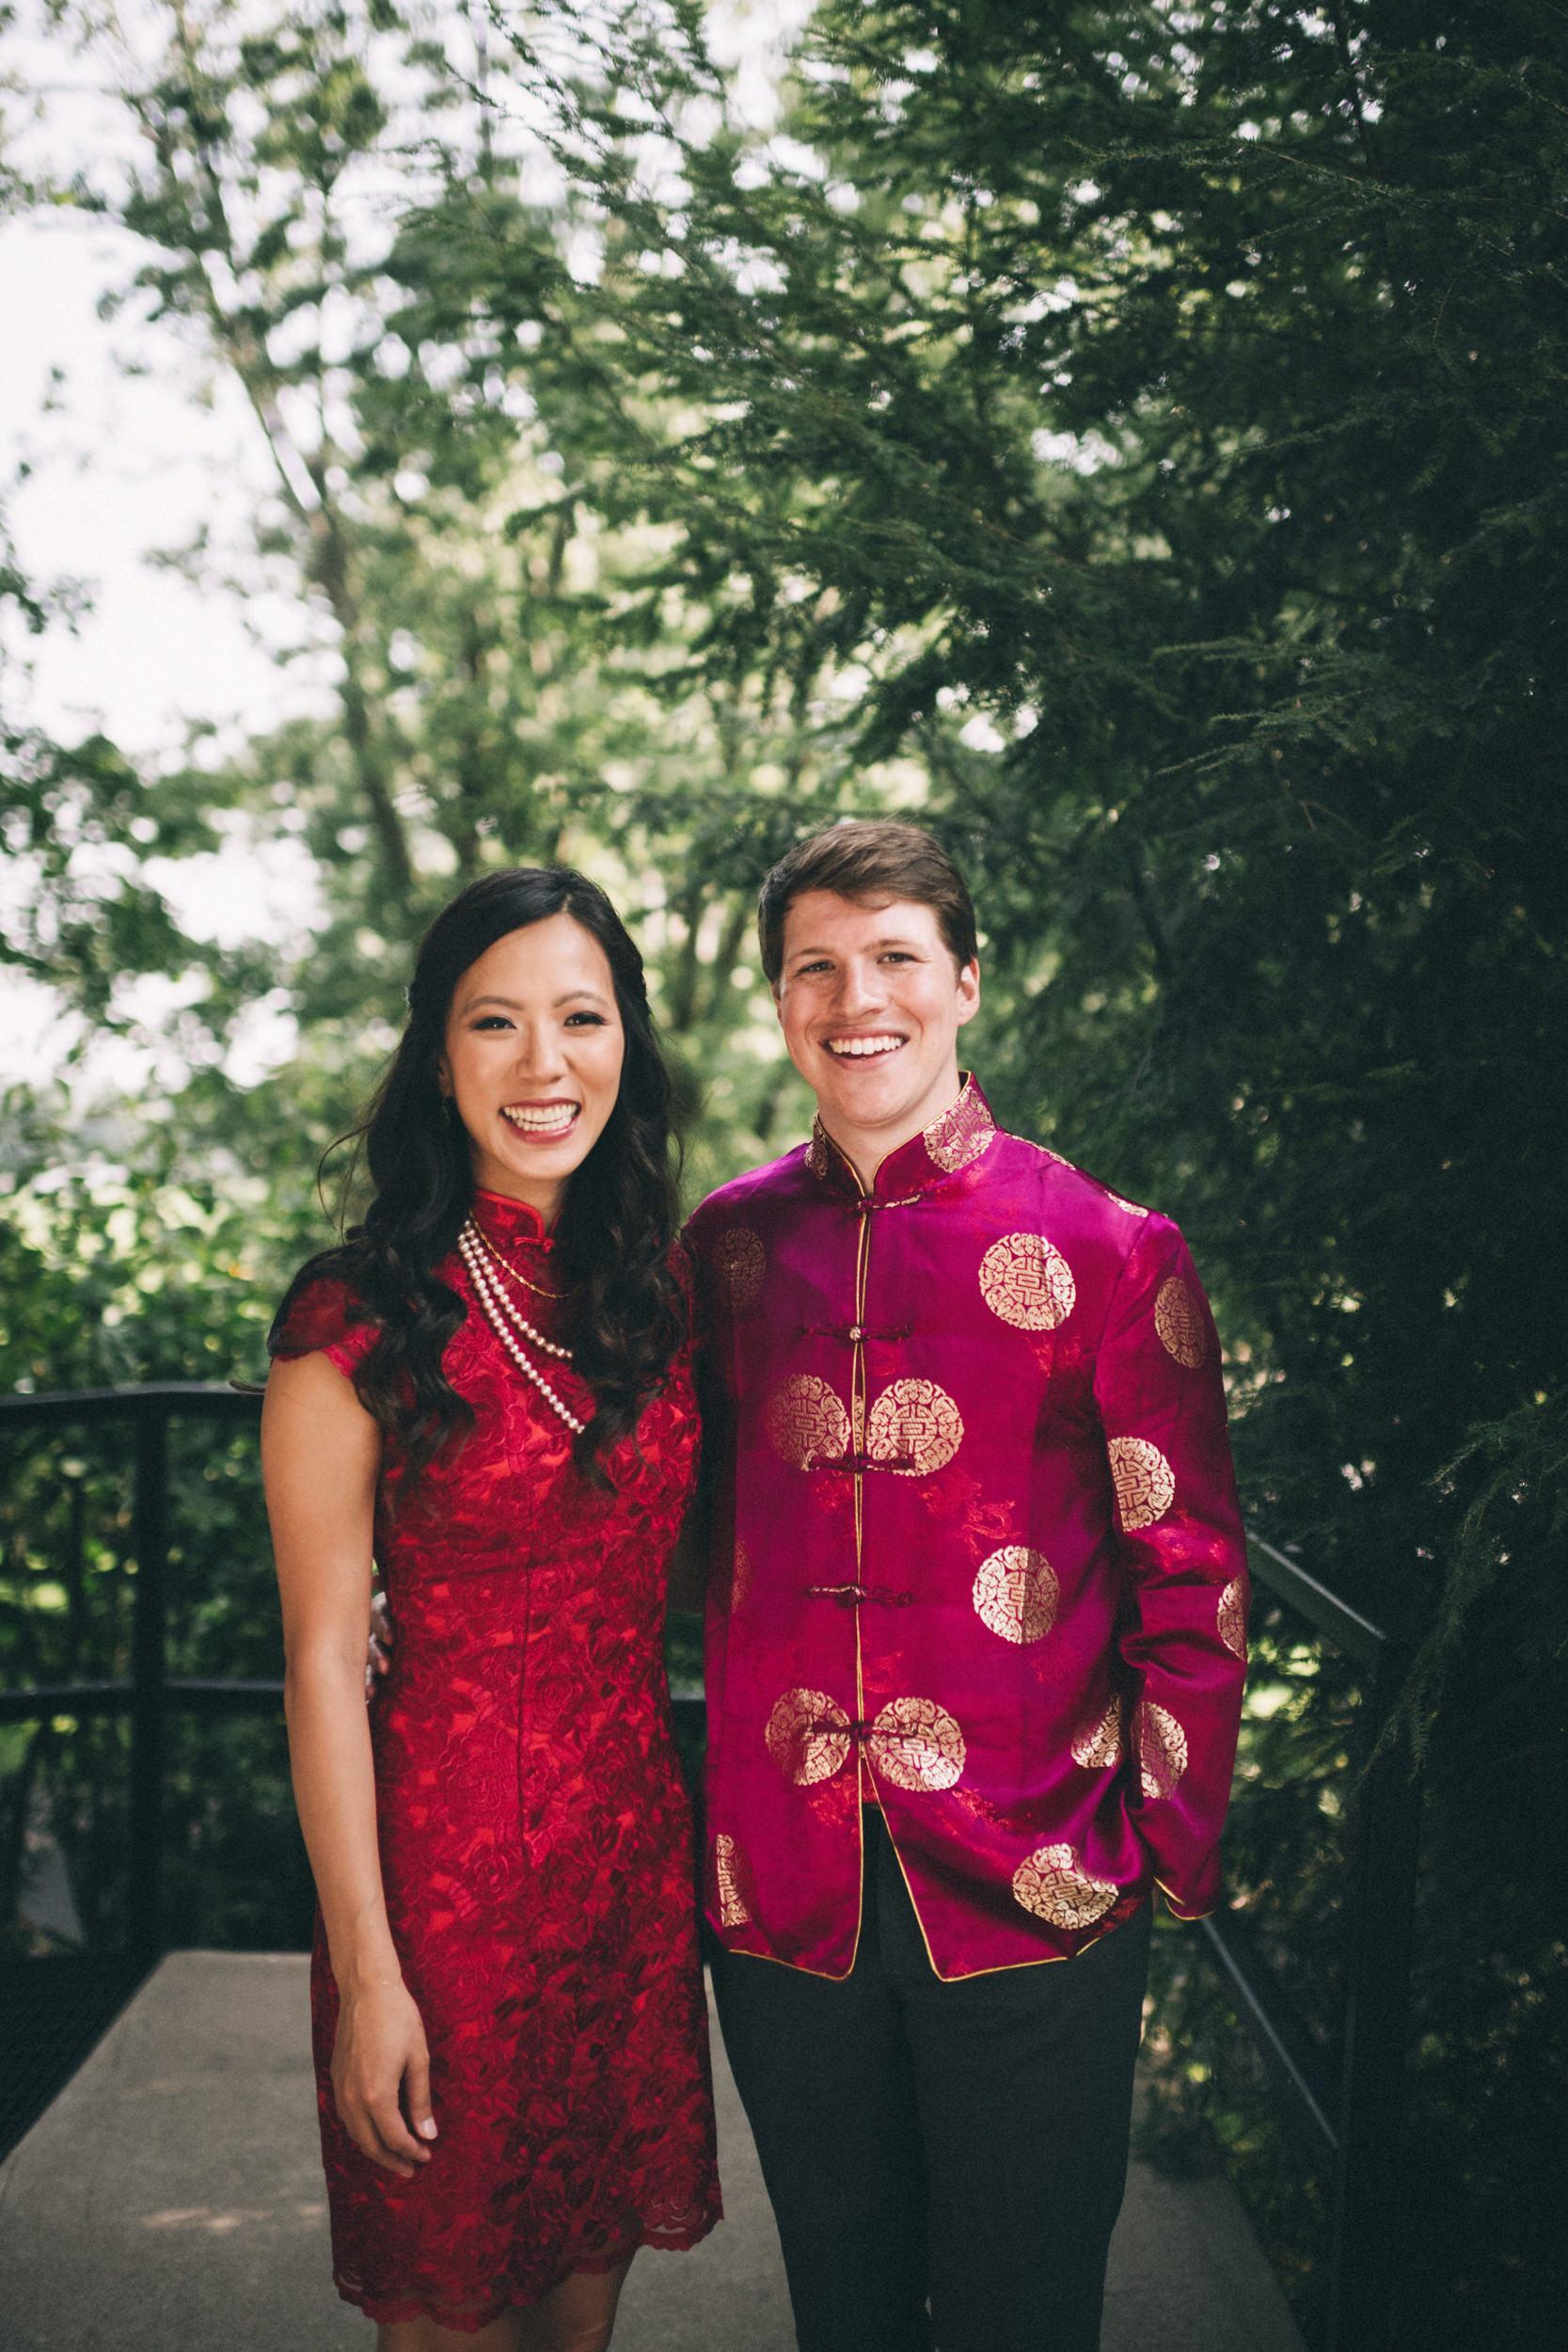 Louisville-Kentucky-Wedding-and-Elopement-Photographer-Sarah-Katherine-Davis-Photography-Summer-Jewel-Toned-Wedding-Chineese-Tea-Ceremony-Warrenwood-Manor-Danville-382.jpg